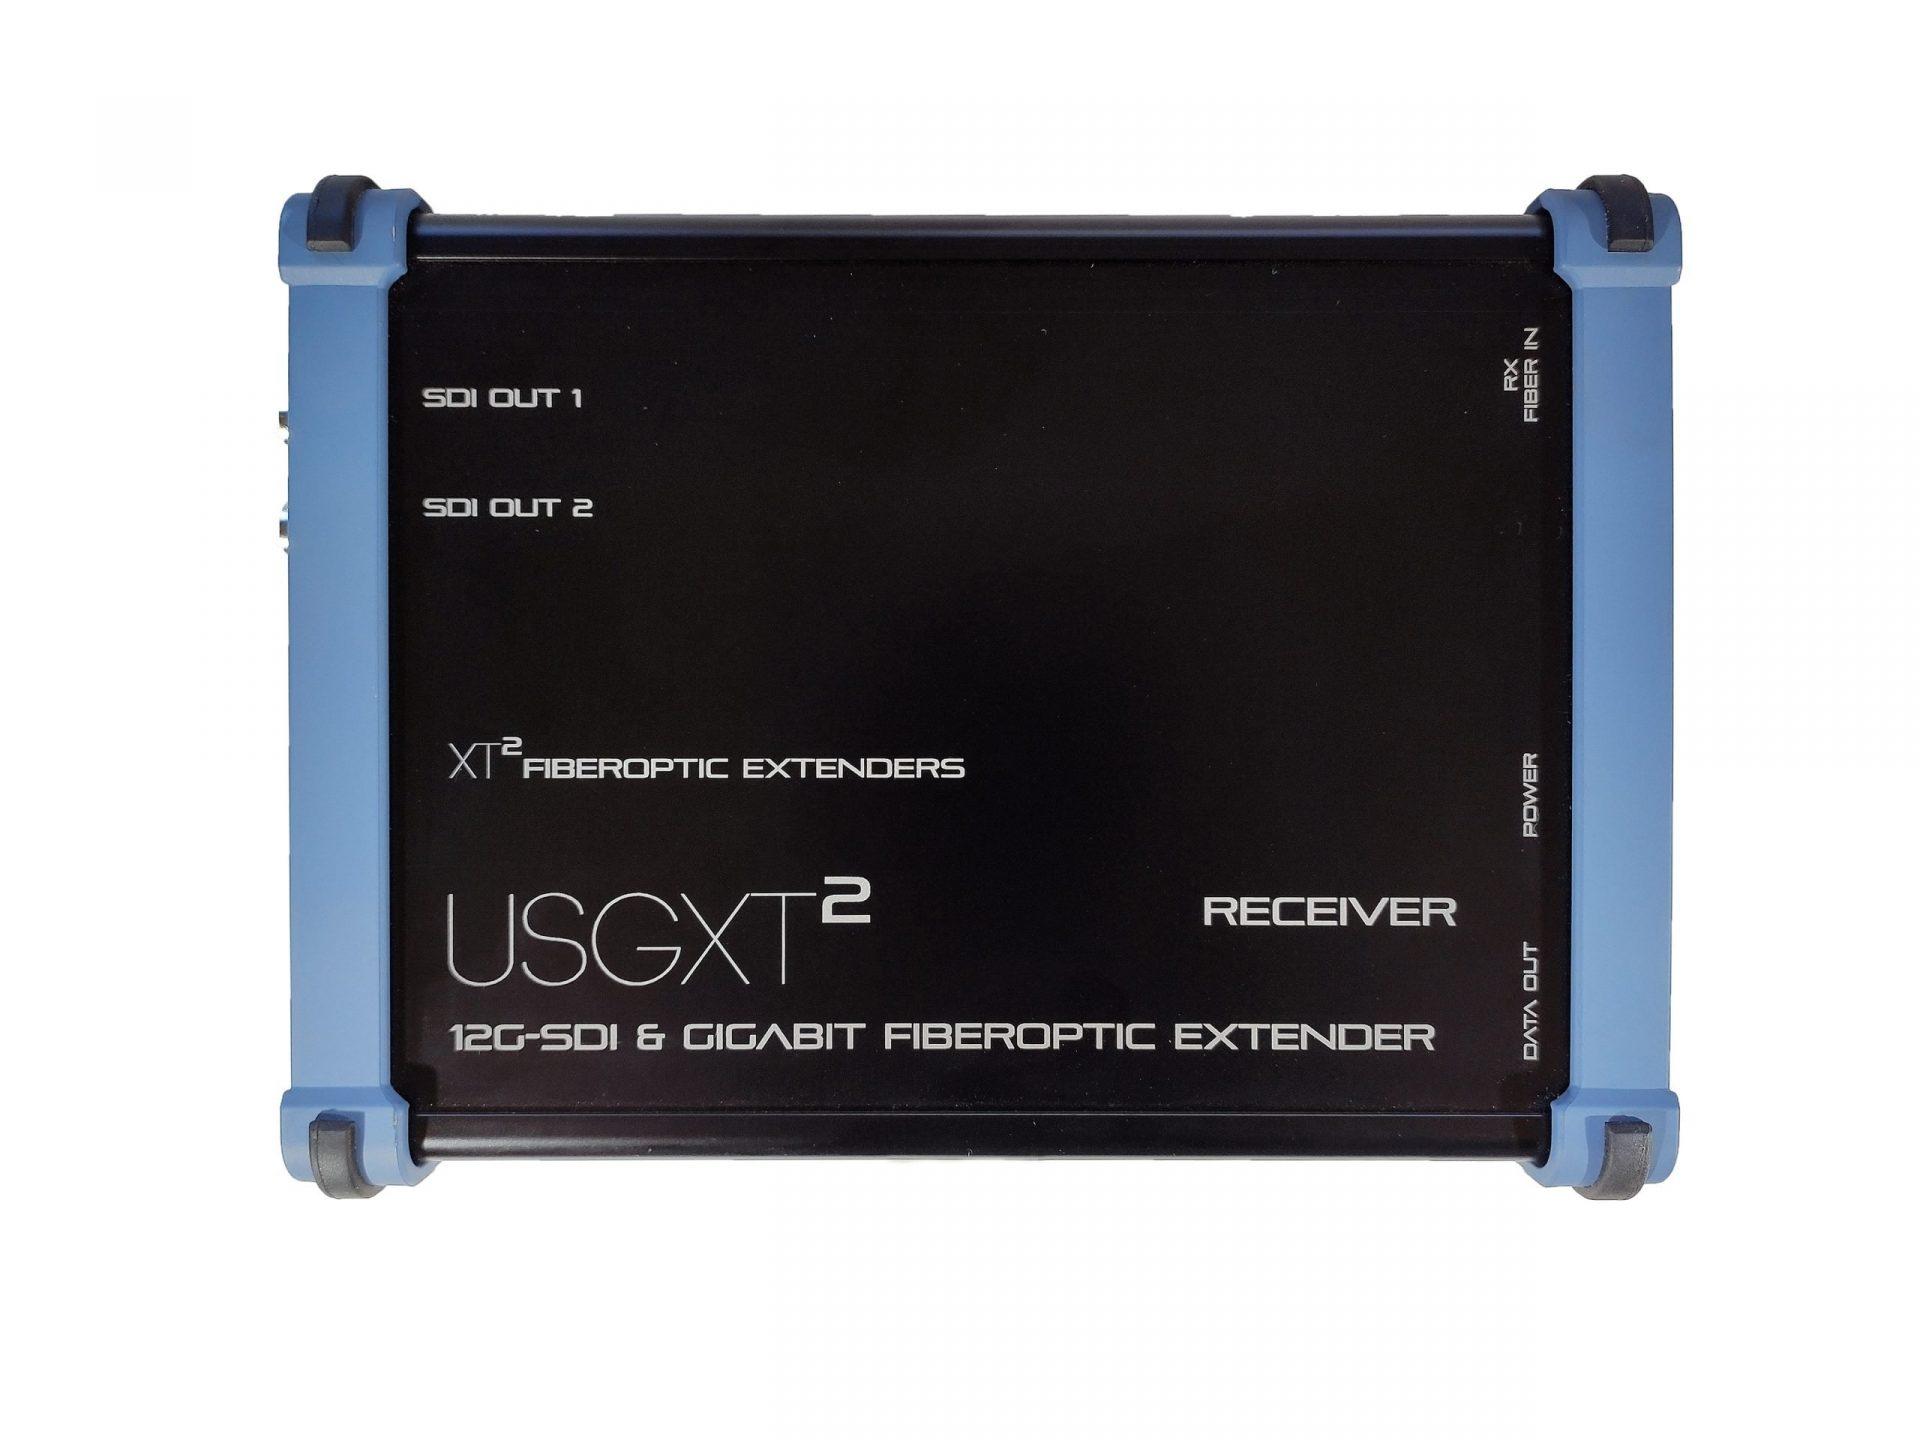 USGXT² - rugged sdi ethernet fiber extenders heavy duty